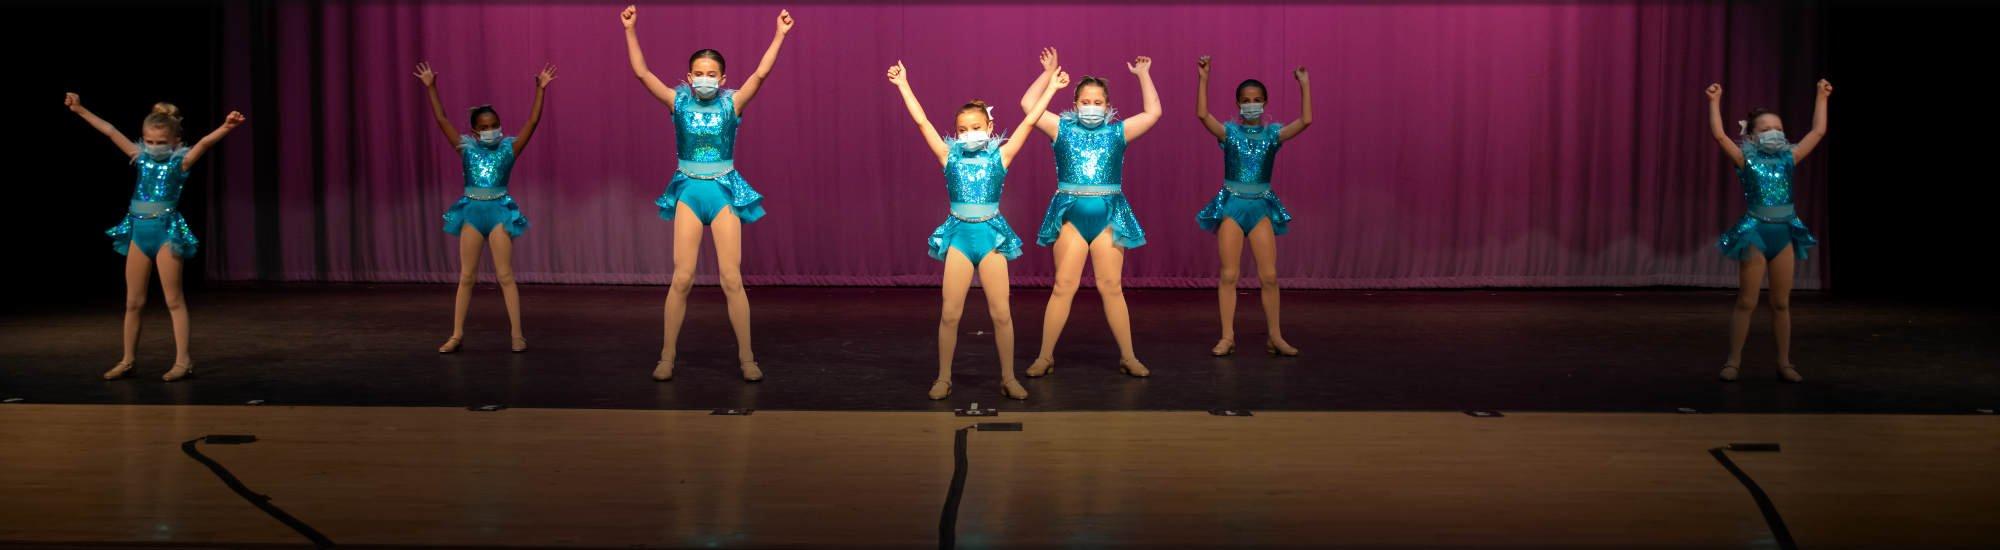 Dance Instruction South Windsor CT